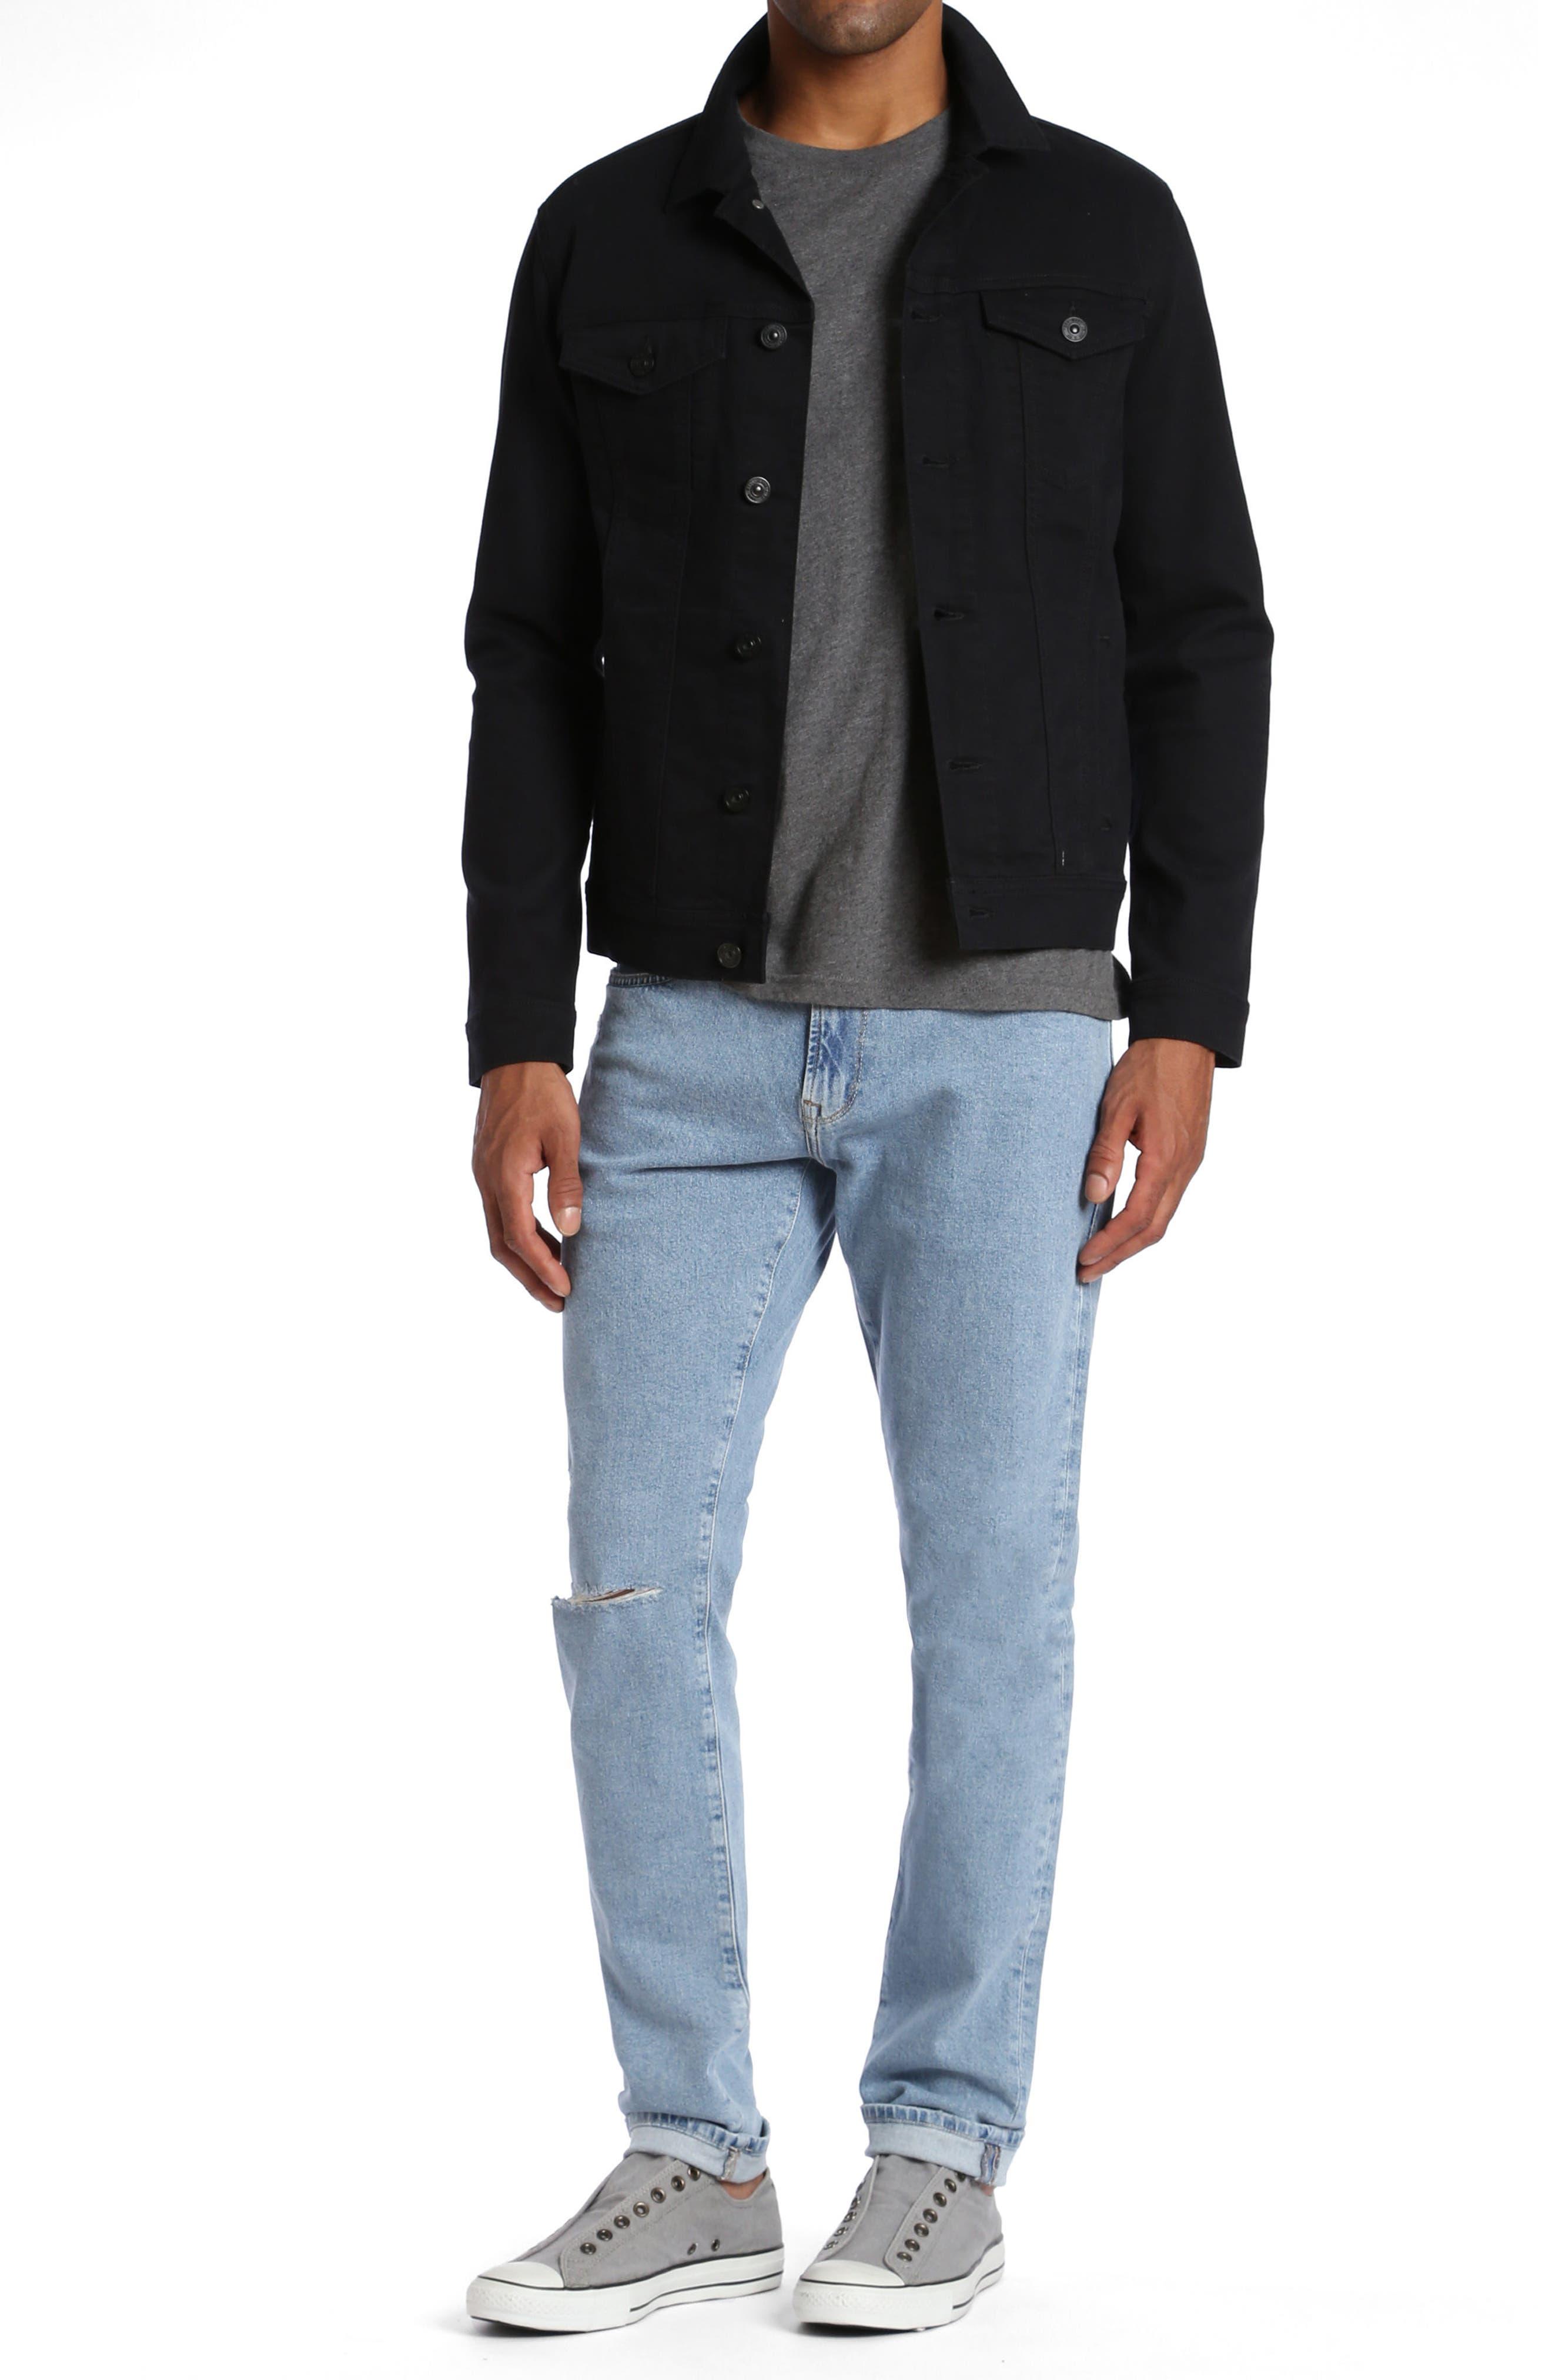 Frank Denim Jacket,                             Alternate thumbnail 4, color,                             Black Comfort